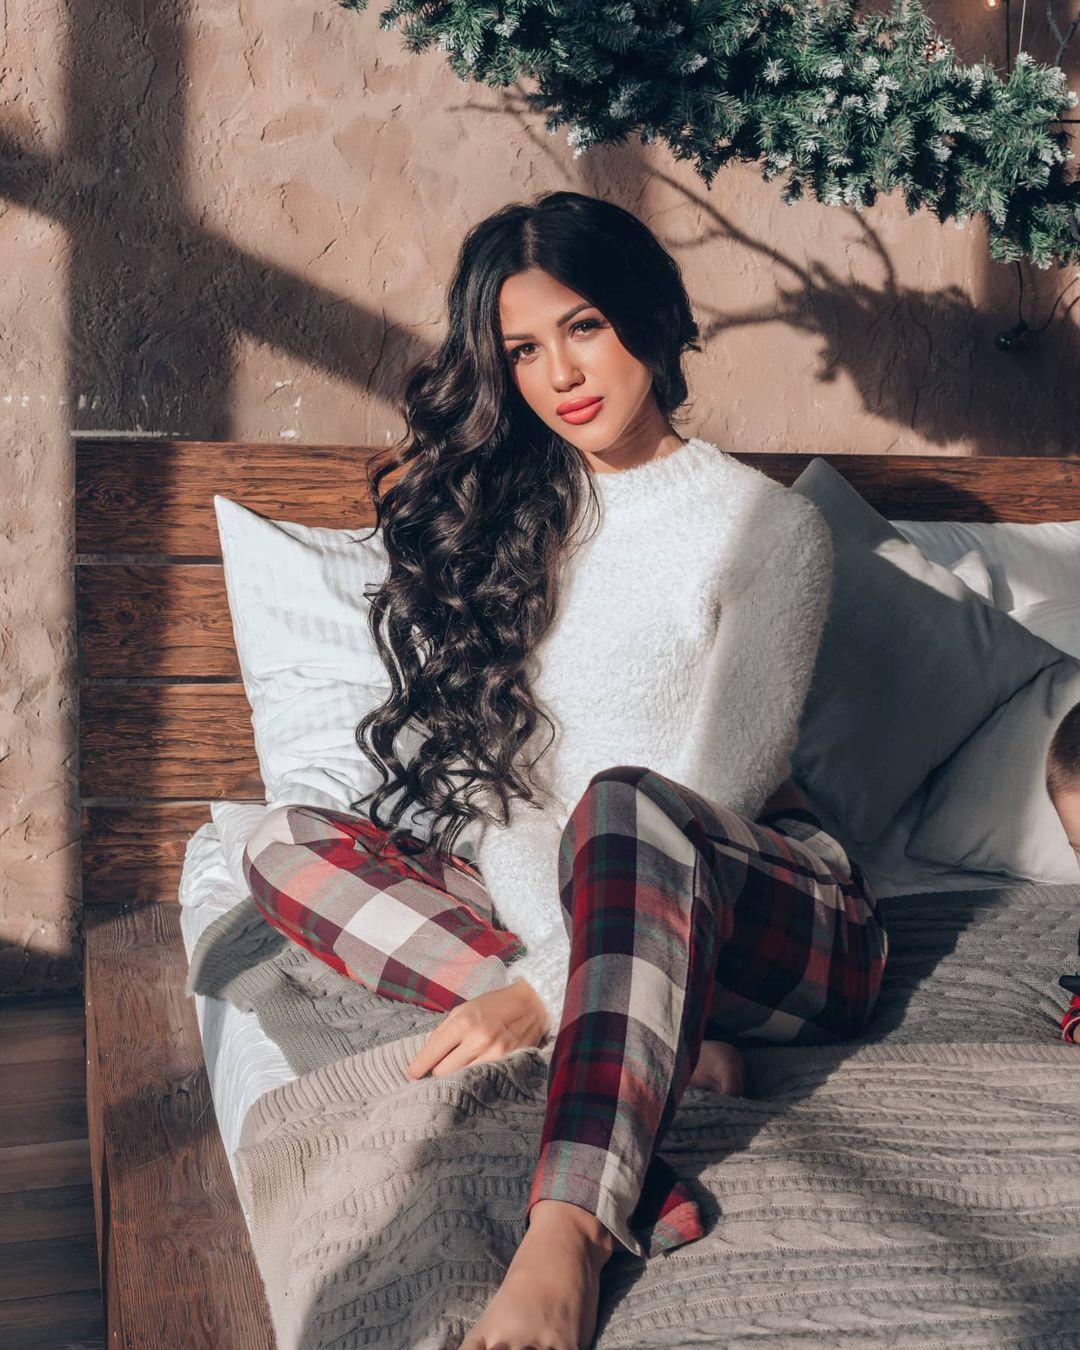 Fatima-Nezhdanova-Wallpapers-Insta-Fit-Bio-2